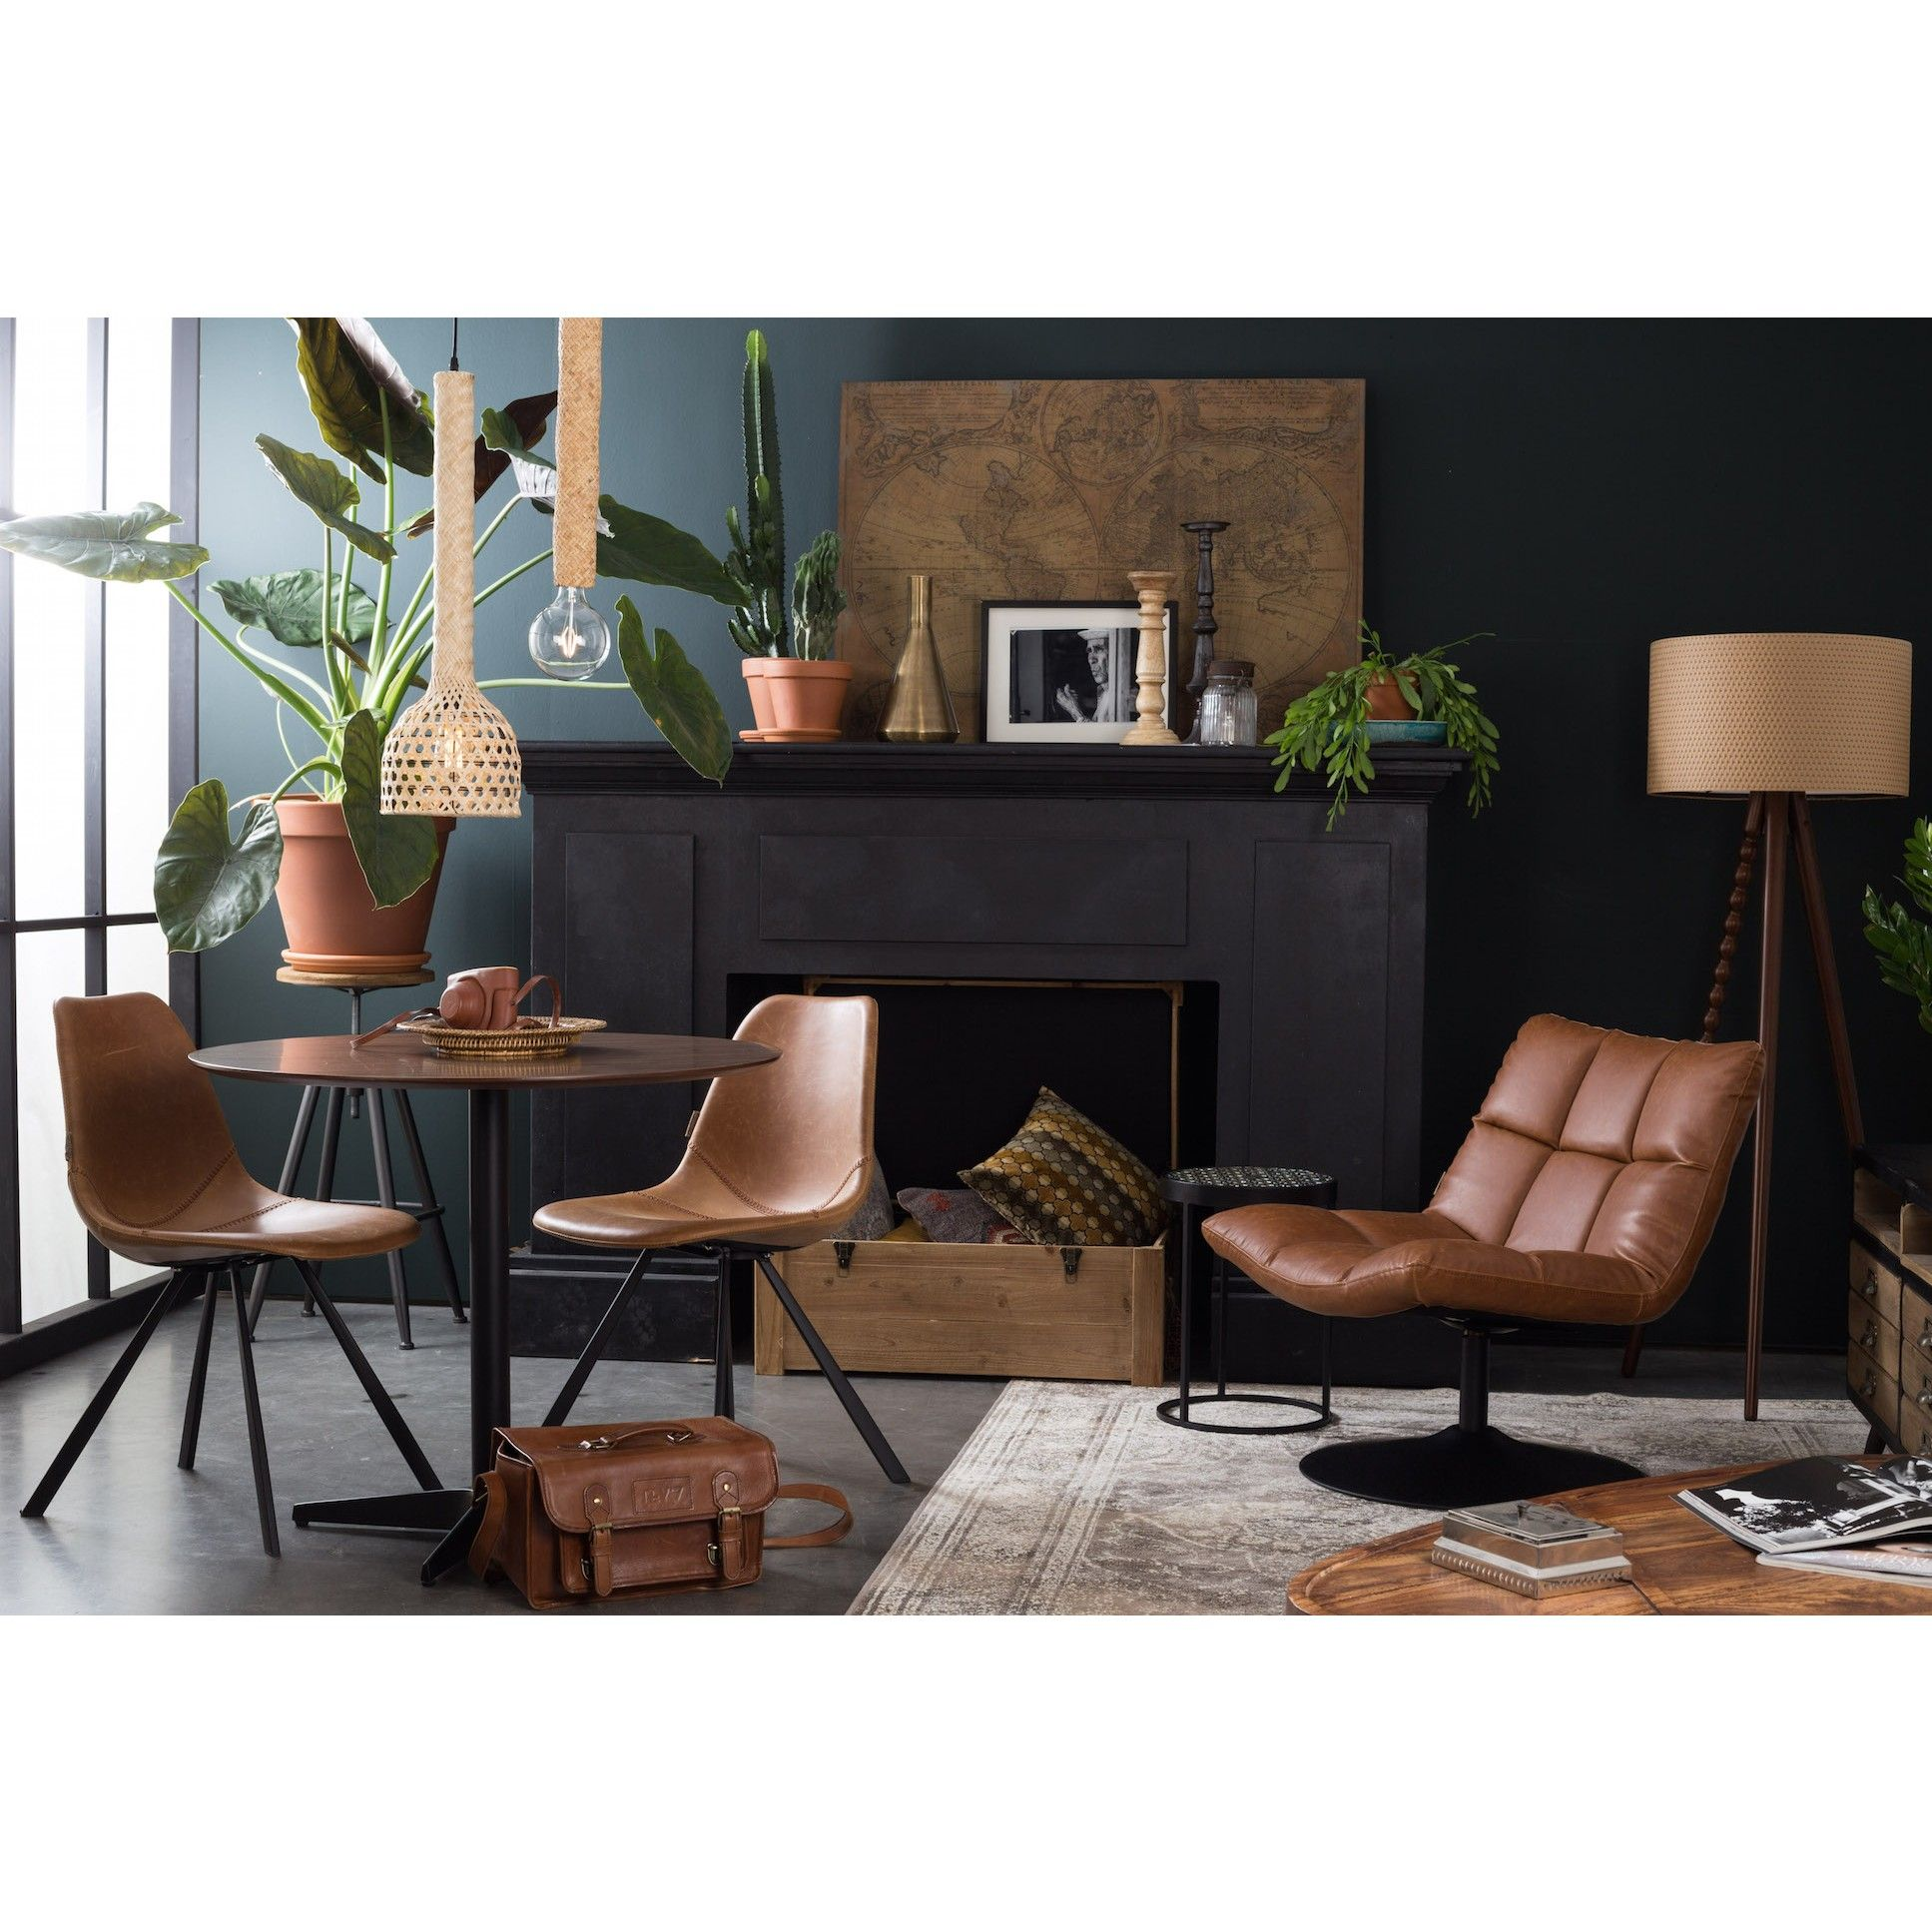 Dutchbone Bar Lounge stoel-Grijs | Droomhuis | Pinterest | Barn loft ...